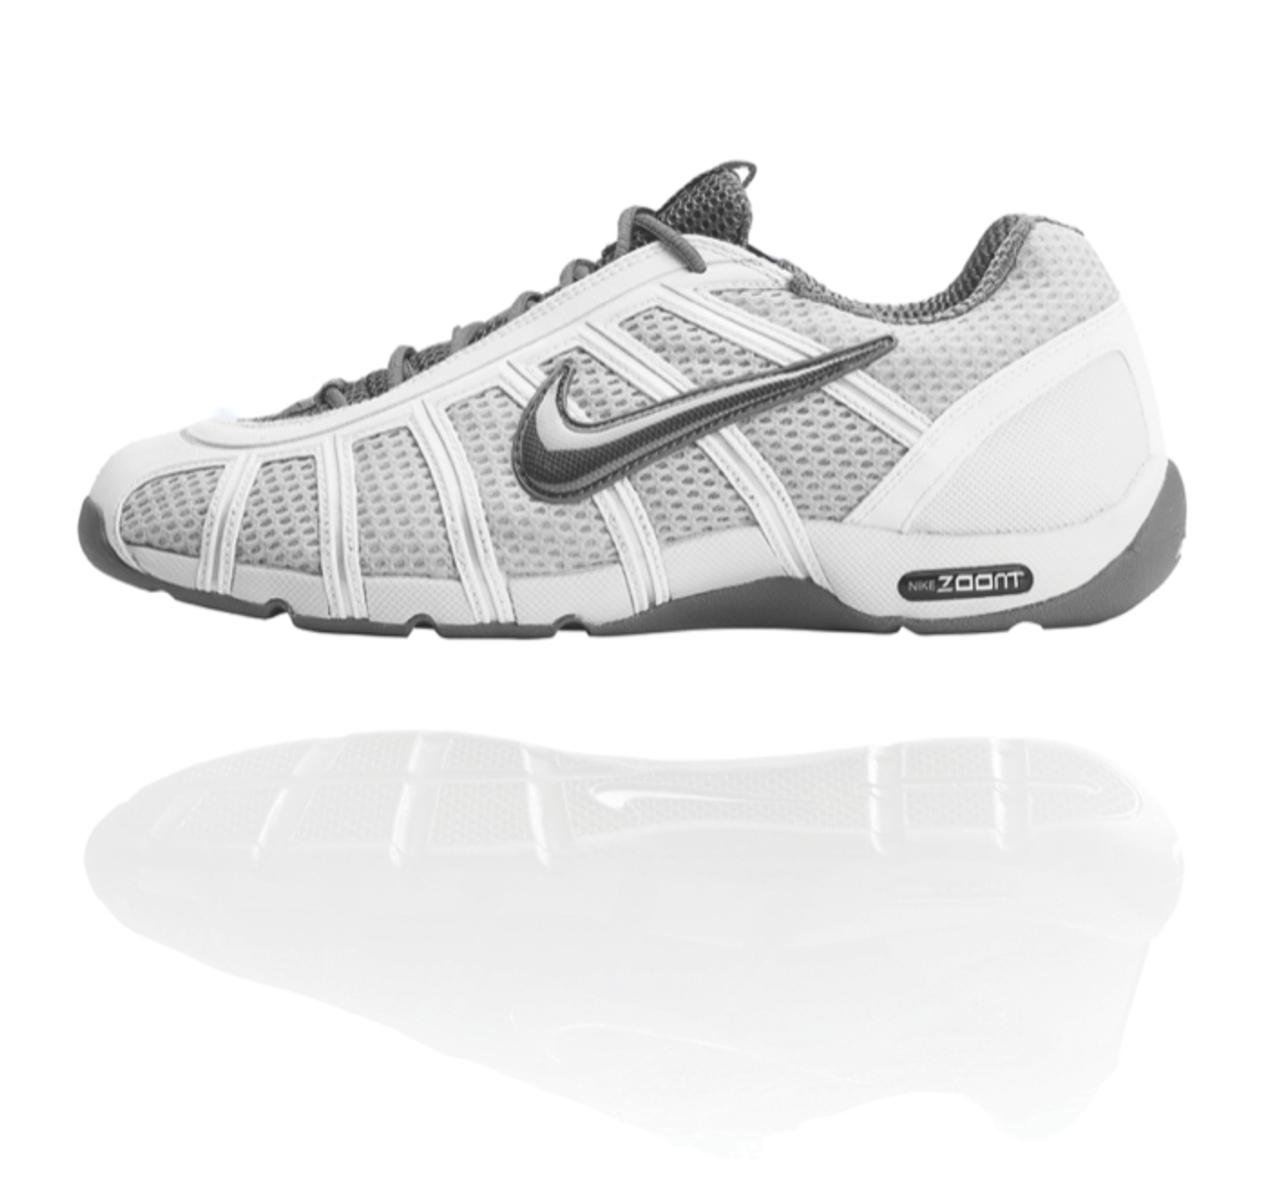 b5f39ed93ebb Nike Air Zoom Fencing Shoe Met Platinum   Black-Flint Gray